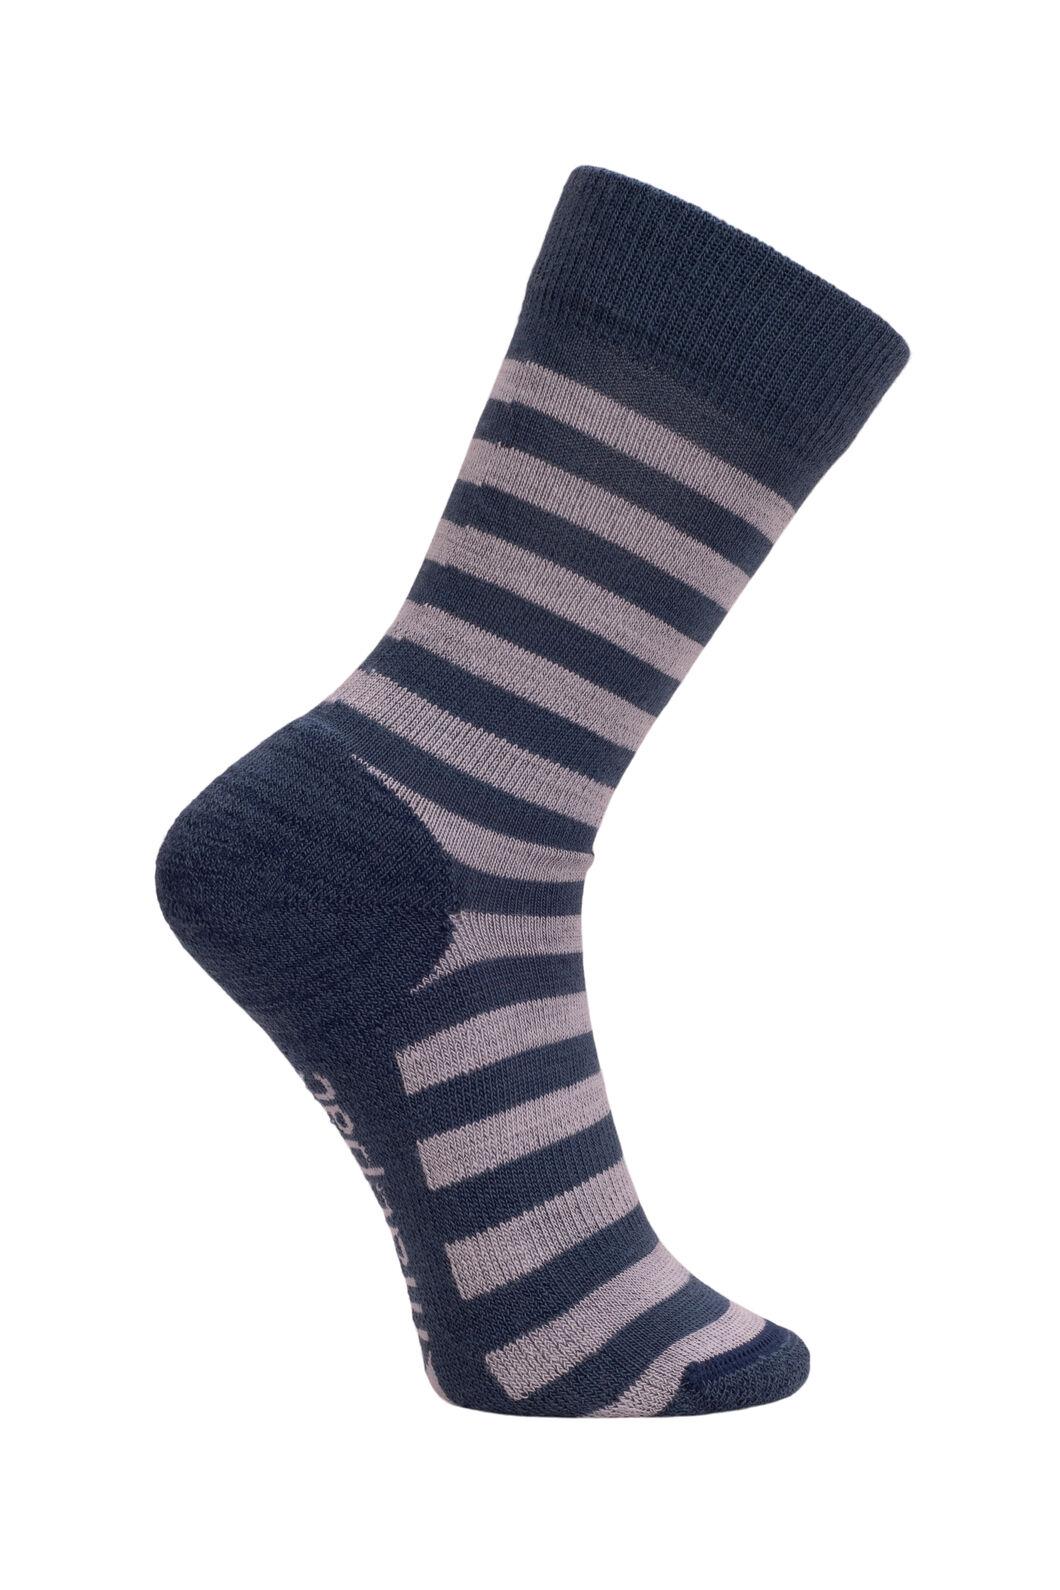 Macpac Footprint Socks Kids', Ensign/High Rise Stripe, hi-res